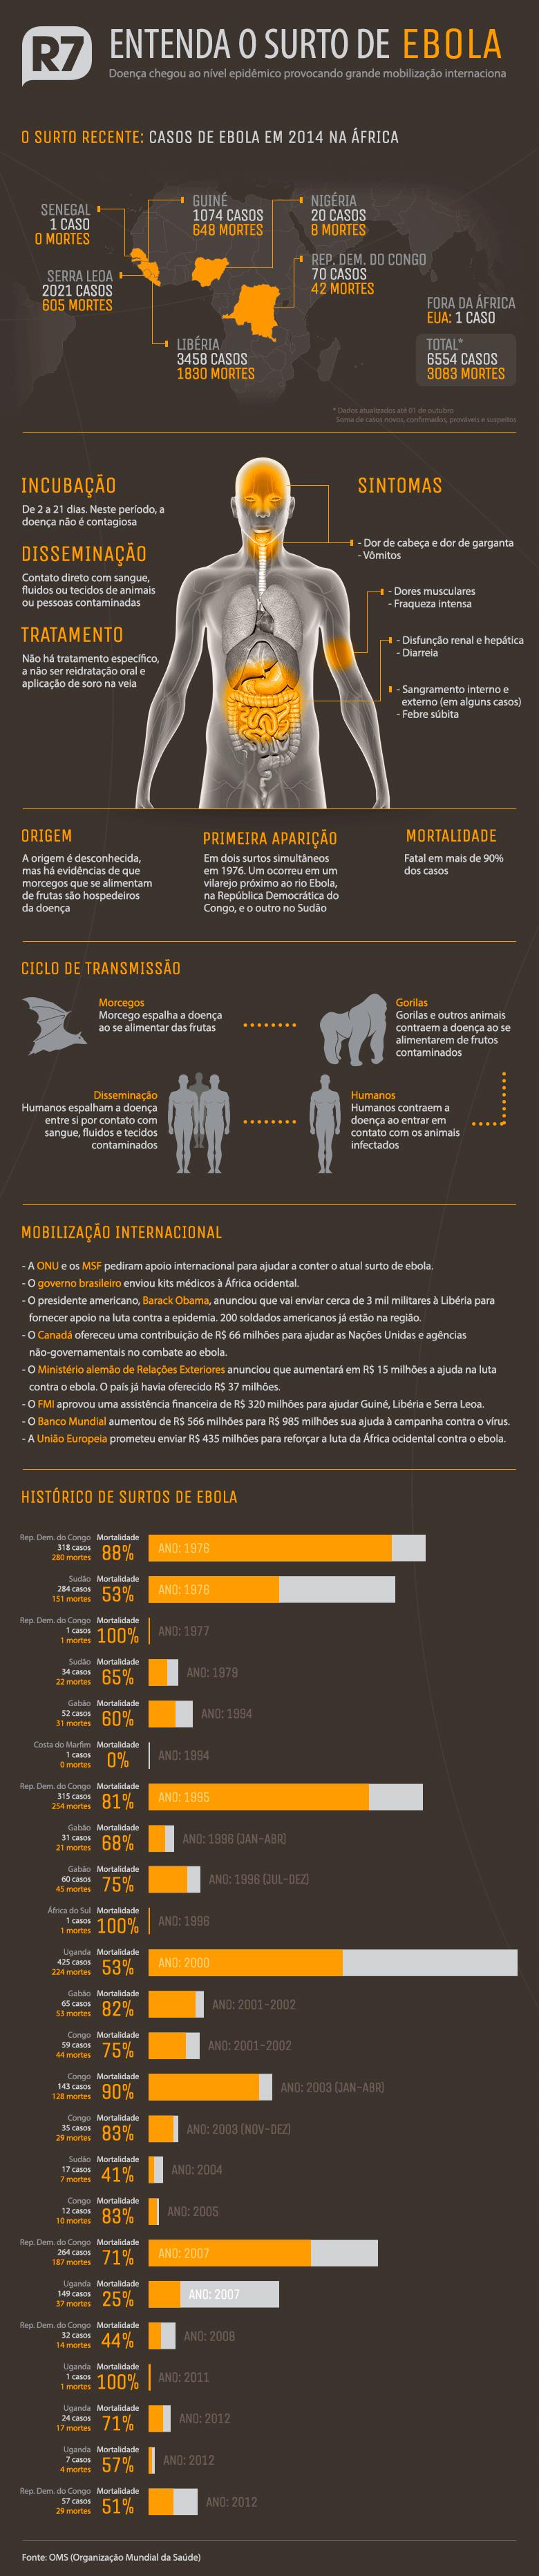 Ebola - Infográfico